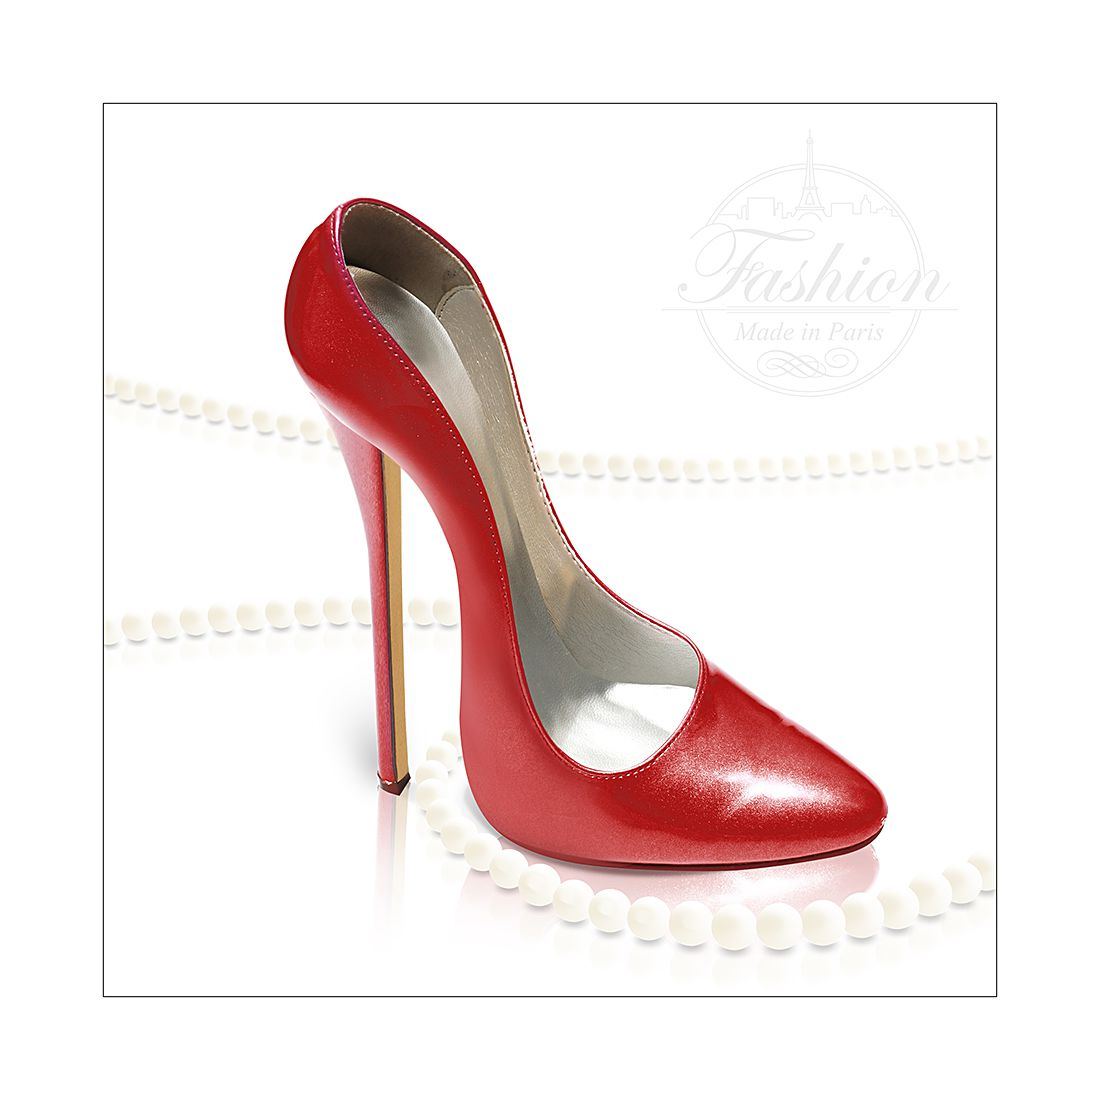 Kunstdruk High Heels I - 20x20cm, Pro Art